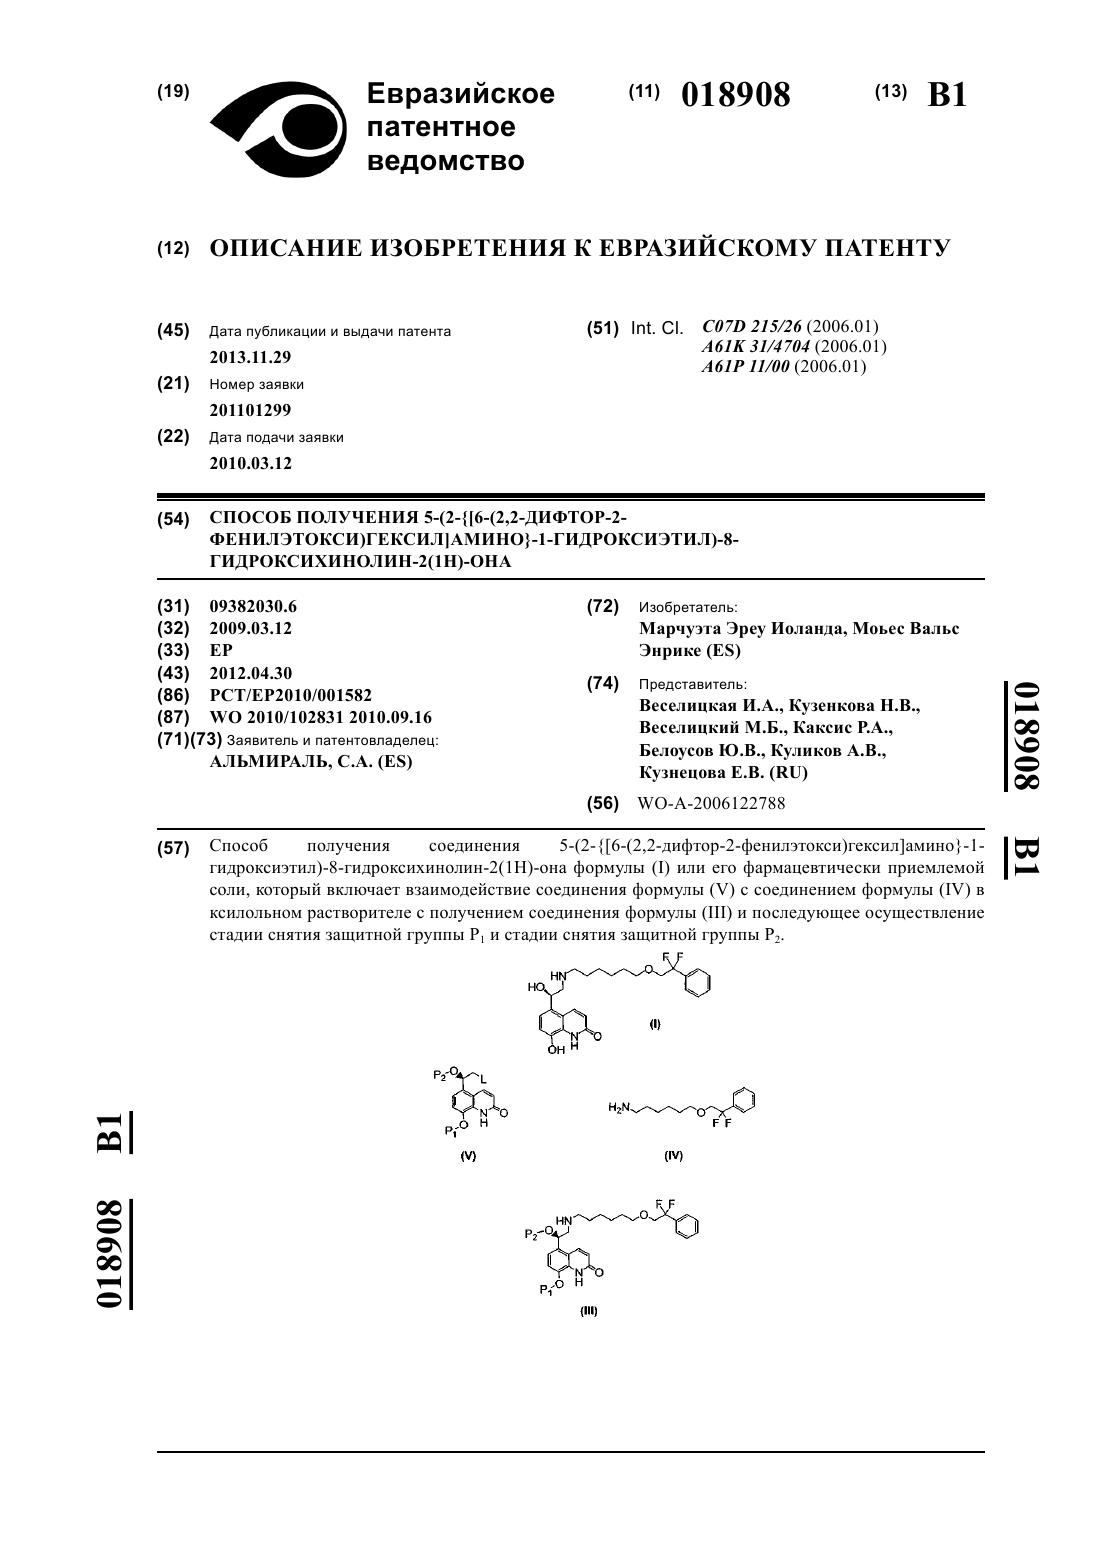 Калия гидроксихинолин фото